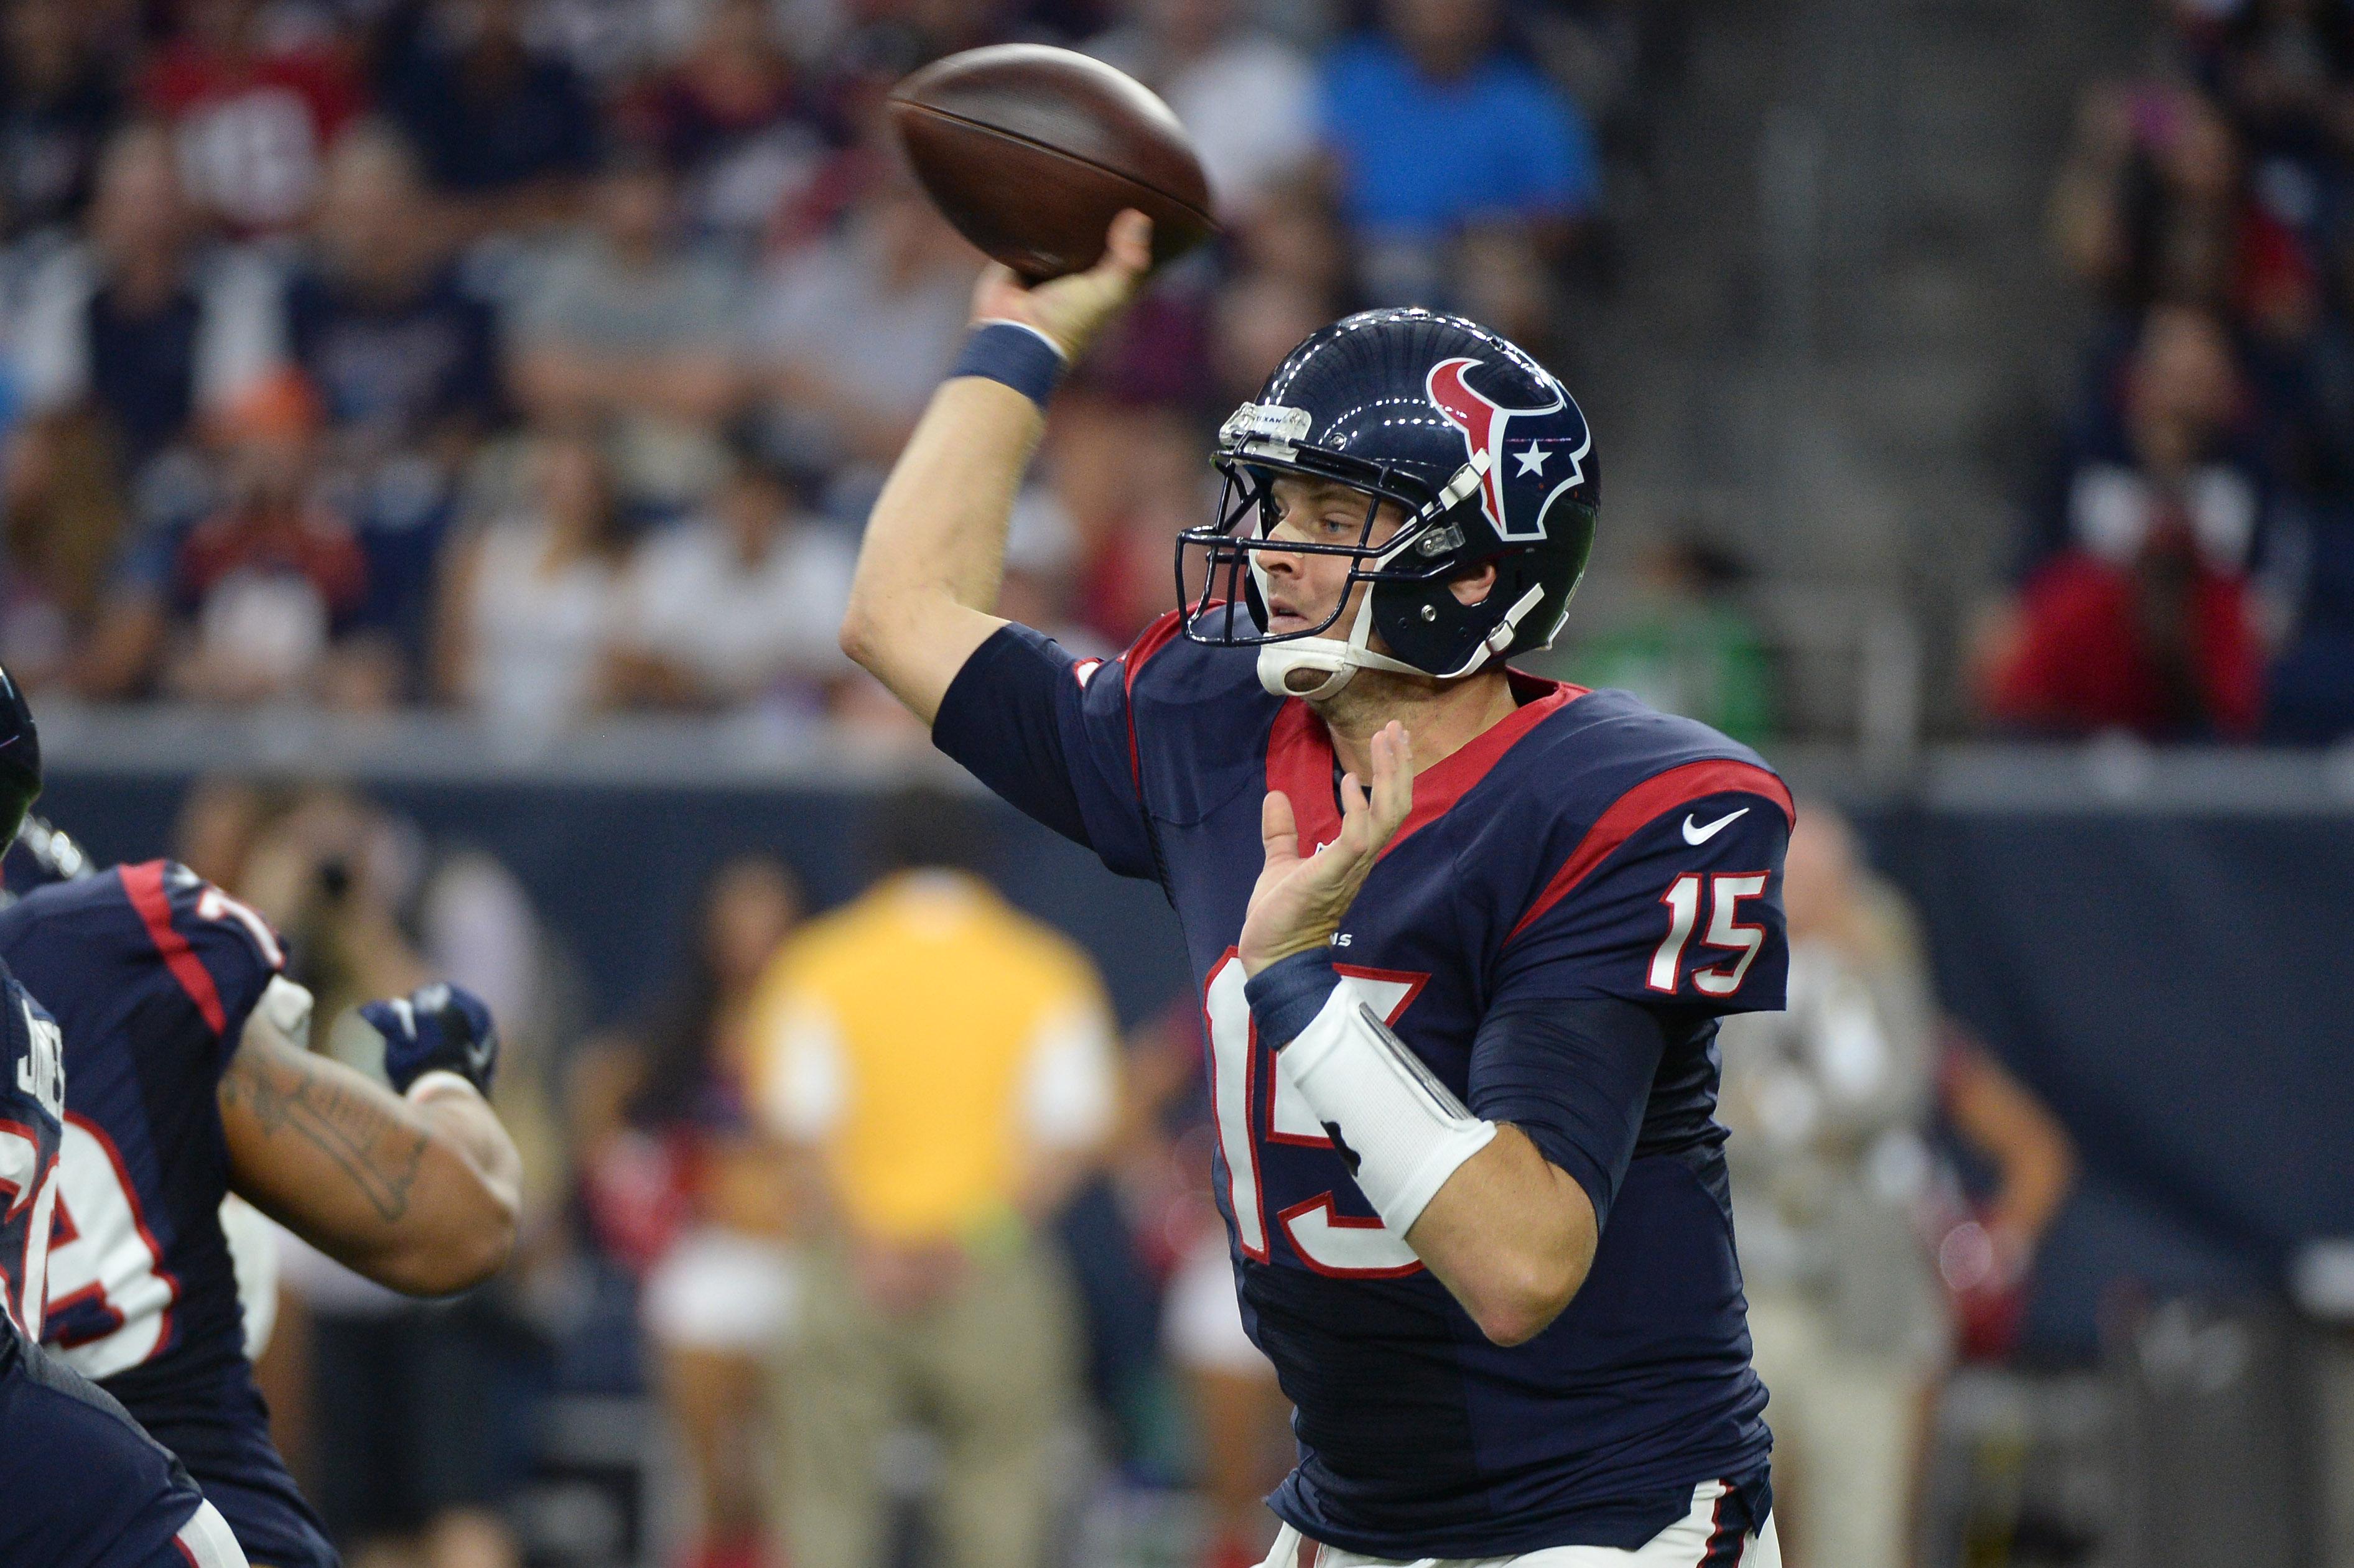 Houston Texans' Ryan Mallett (15) throws against the Denver Broncos during the first half of an NFL preseason football game, Saturday, Aug. 22, 2015, in Houston. (AP Photo/George Bridges)